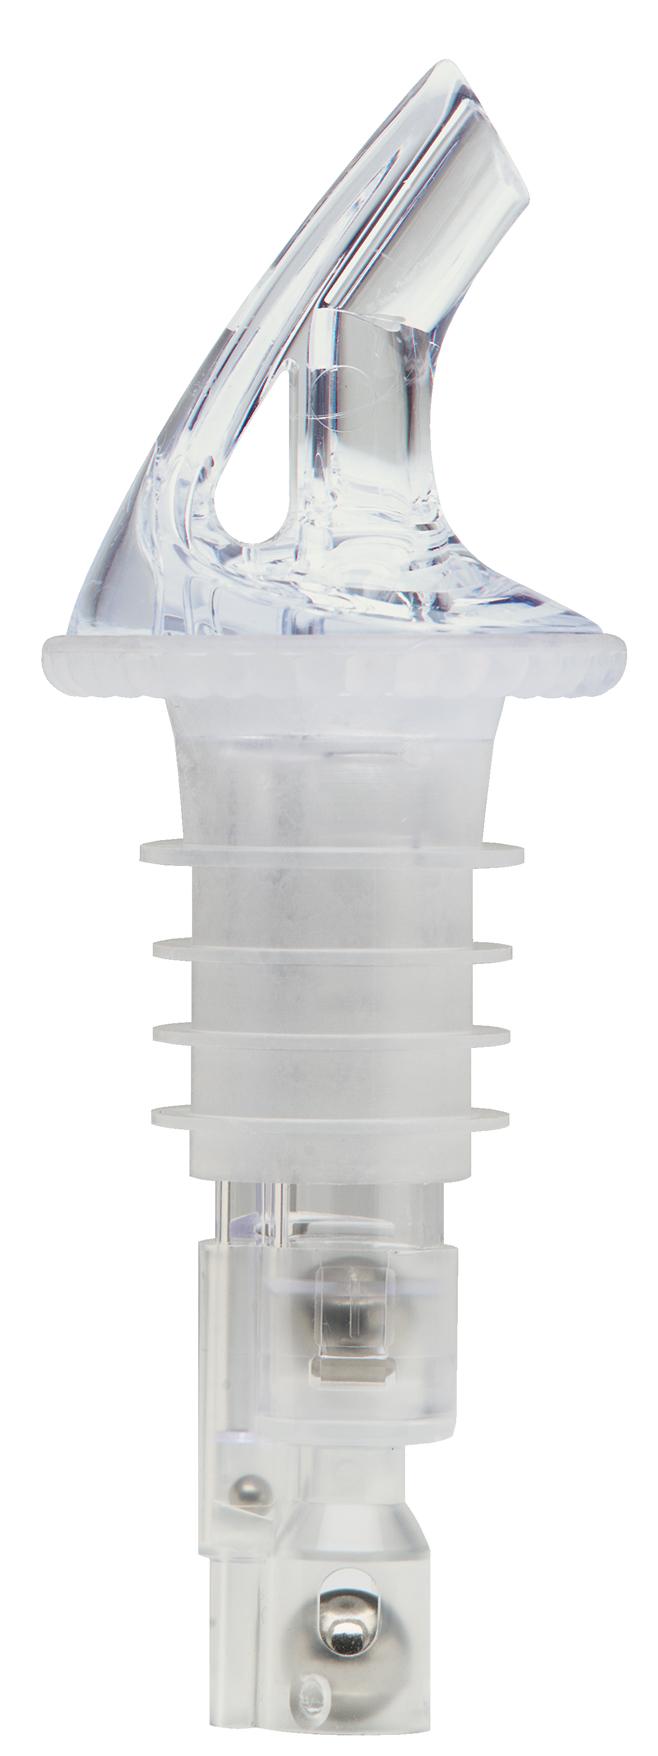 Bar Maid/Glass Pro BMP-1150C liquor pourers